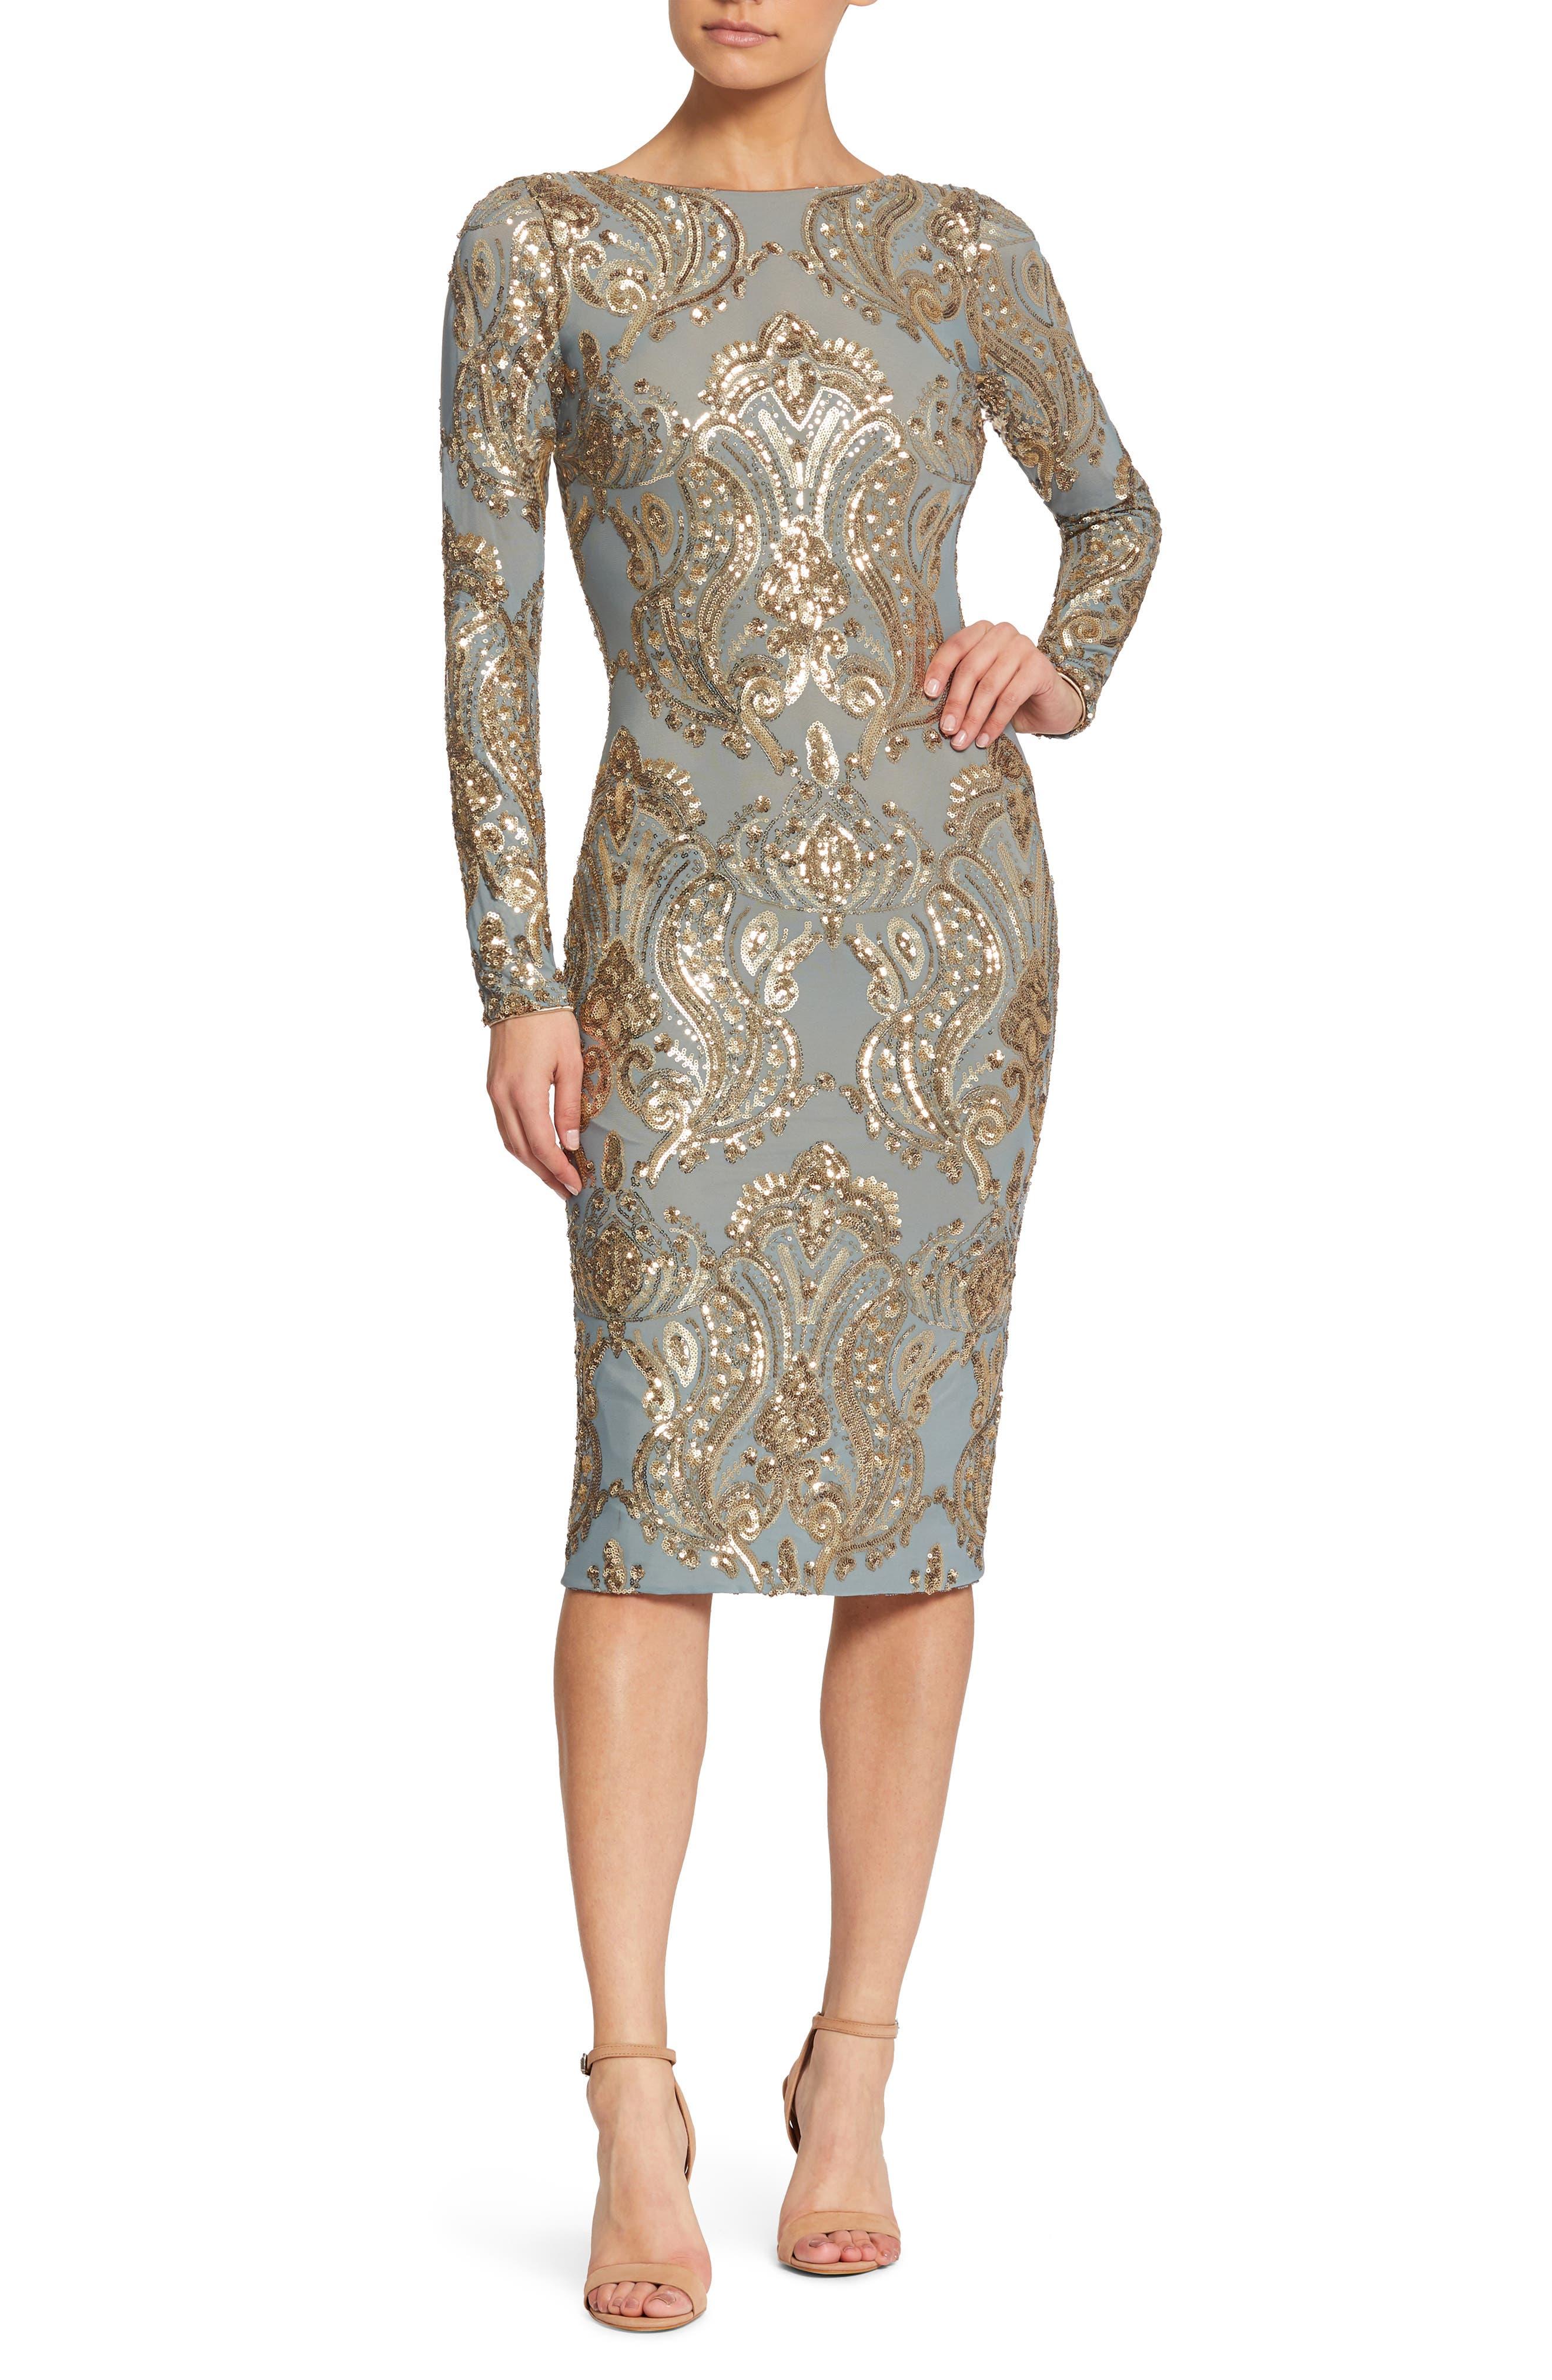 Emery Sequin Sheath Dress,                             Main thumbnail 1, color,                             Teal/ Gold